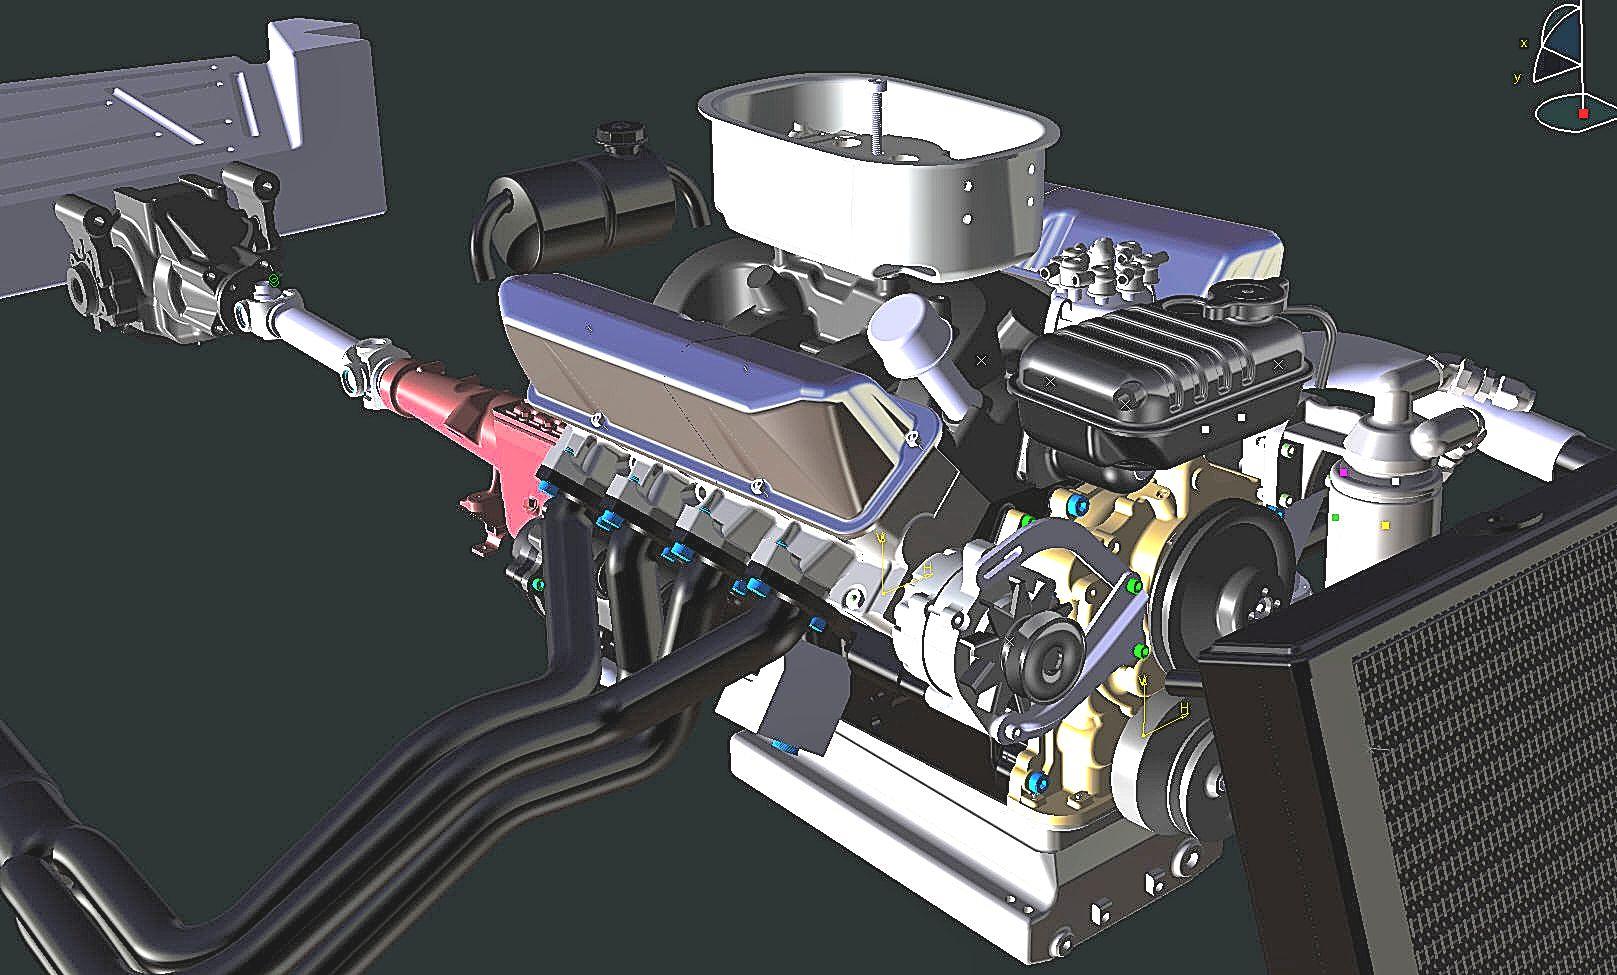 Essex Cobra scale model cad engine